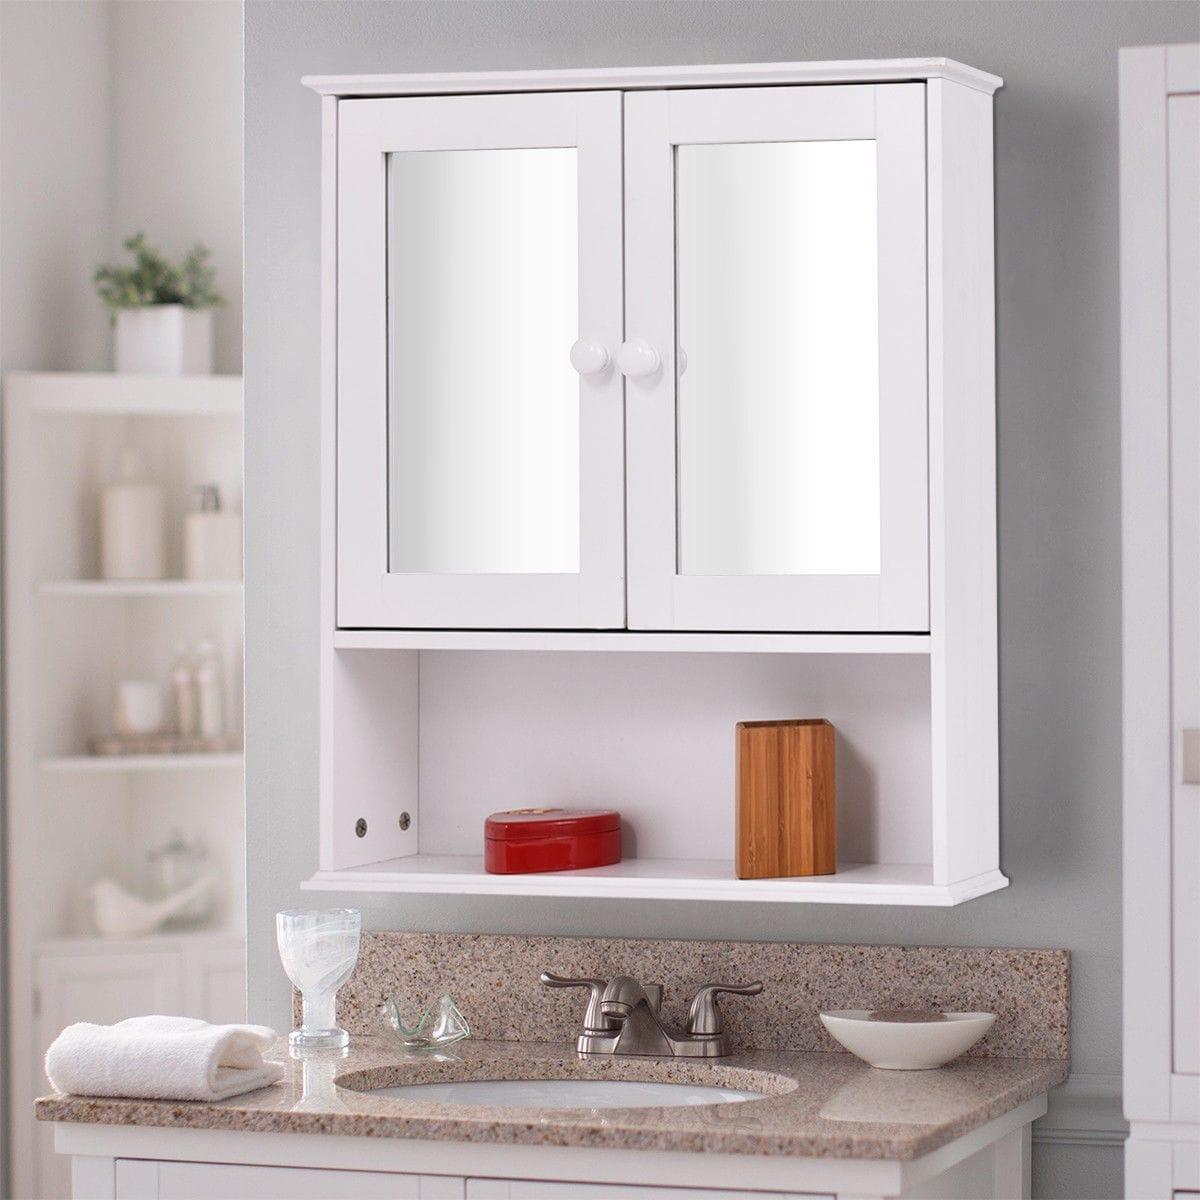 Shop Costway New Bathroom Wall Cabinet Double Mirror Door Cupboard ...